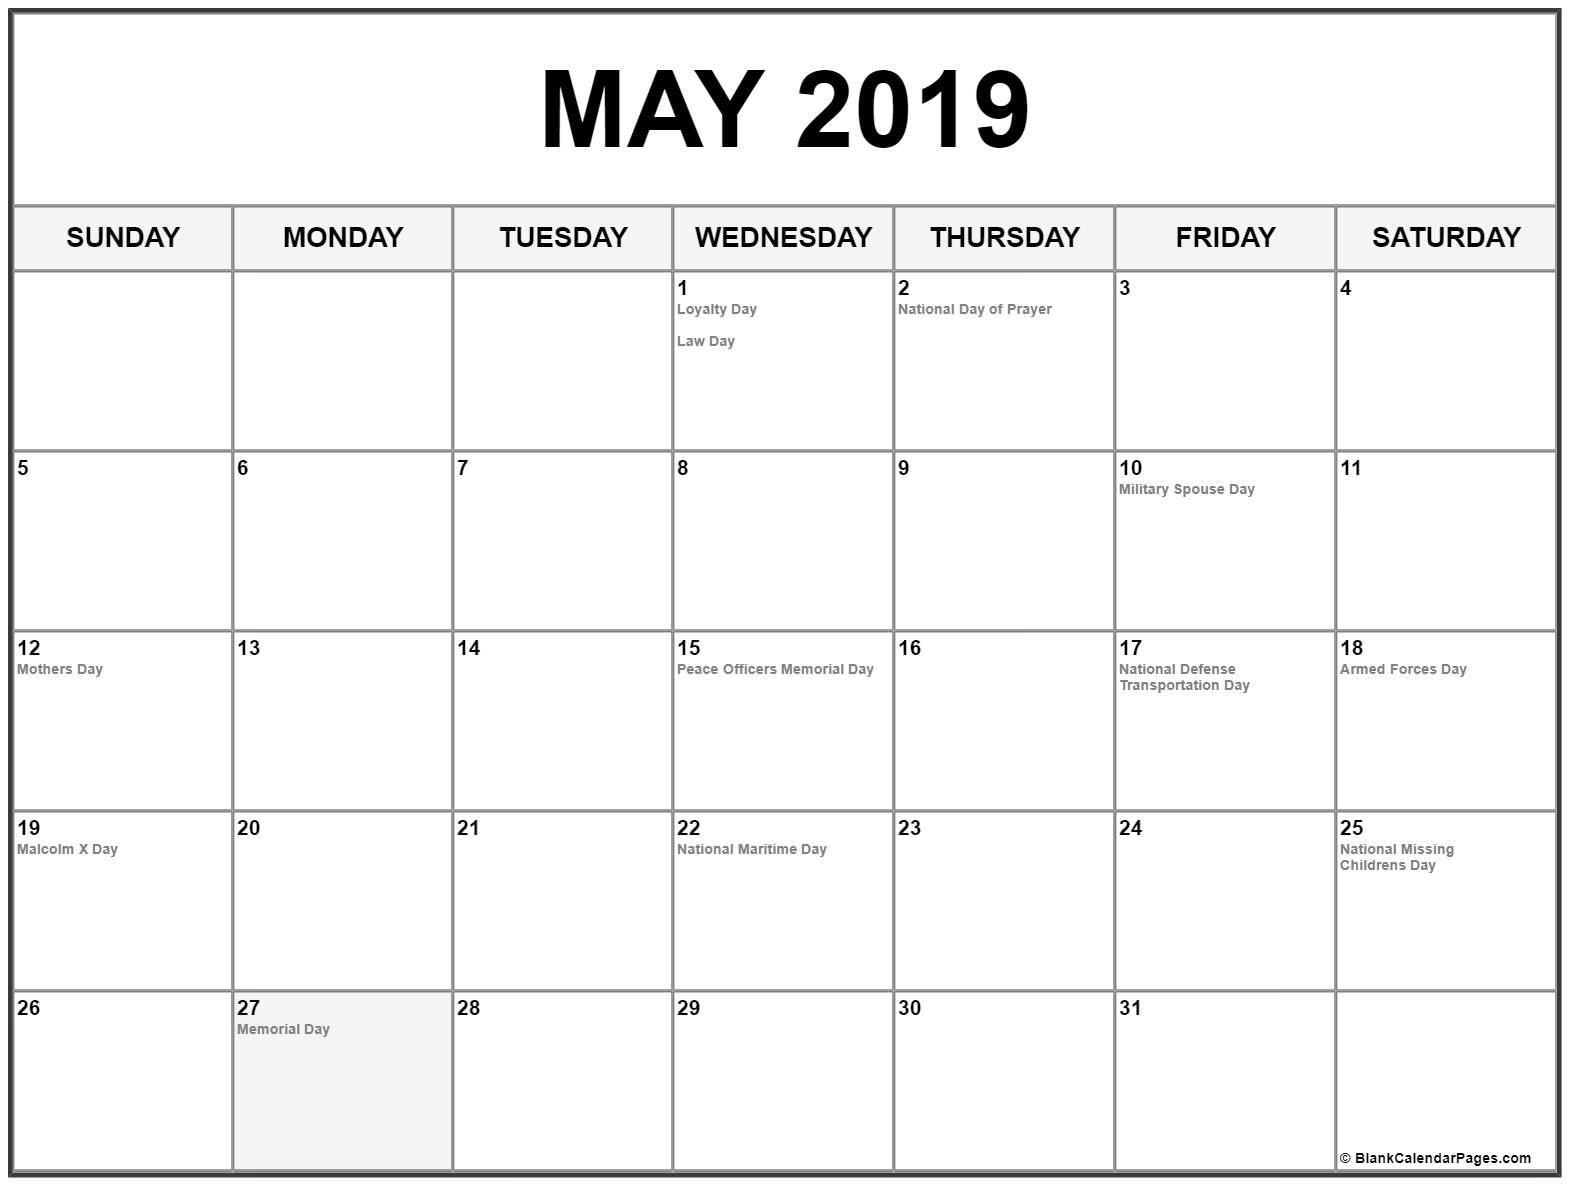 May 2019 Calendar Us Holidays | 2019 Calendar Monthly